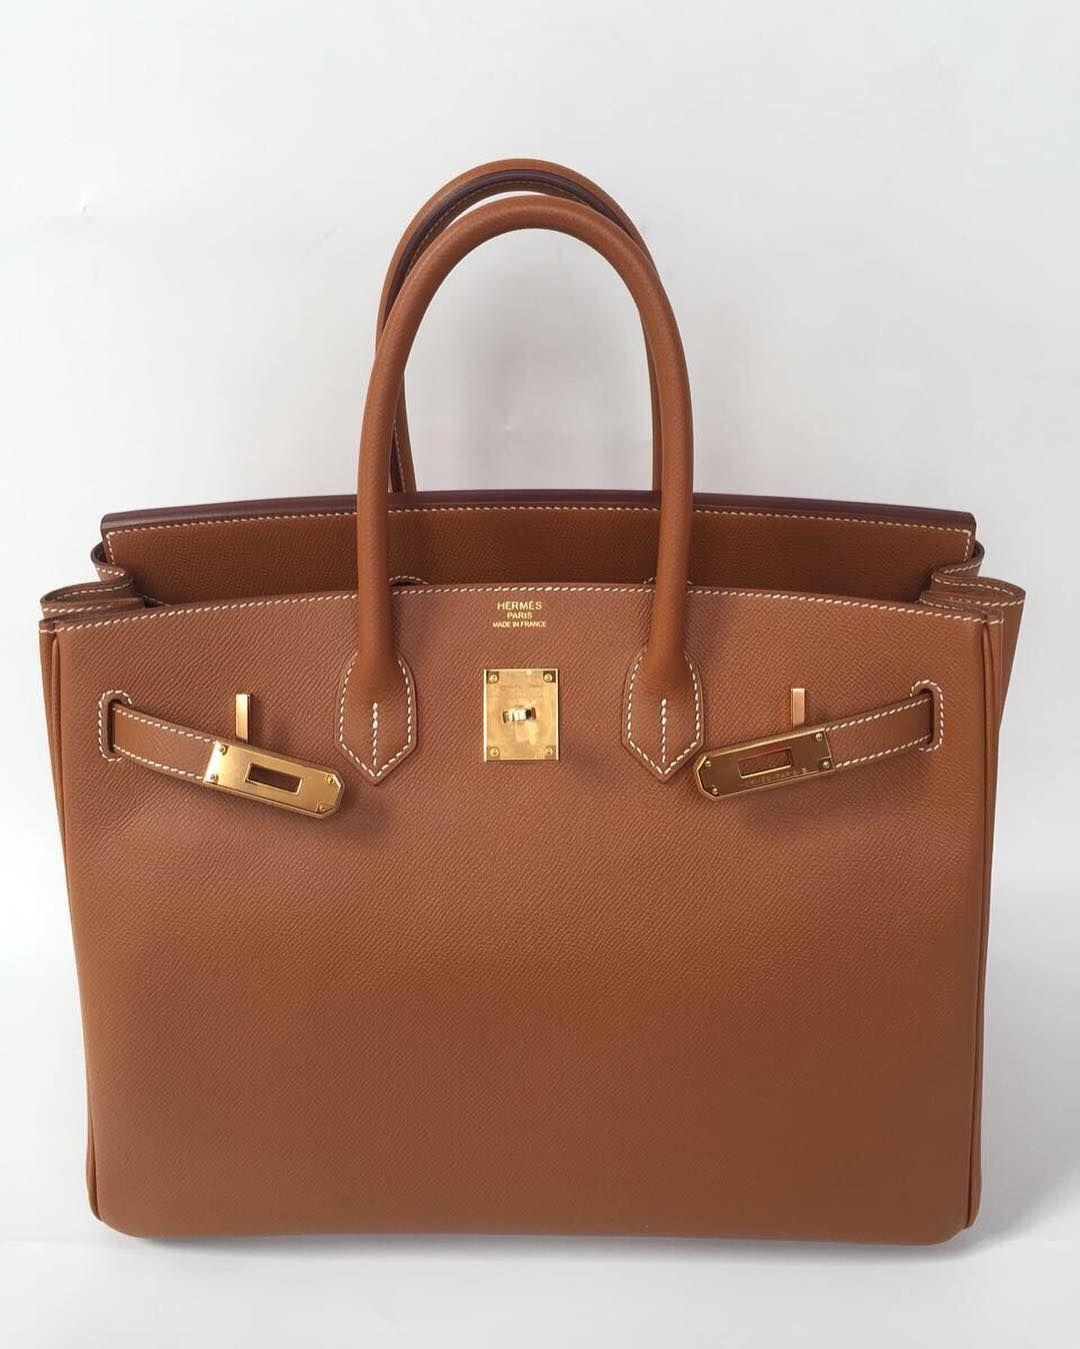 d69456372b Hermes Birkin 35 Gold Epsom Ghw A | HANDBAGS | Hermes bags, Bags ...